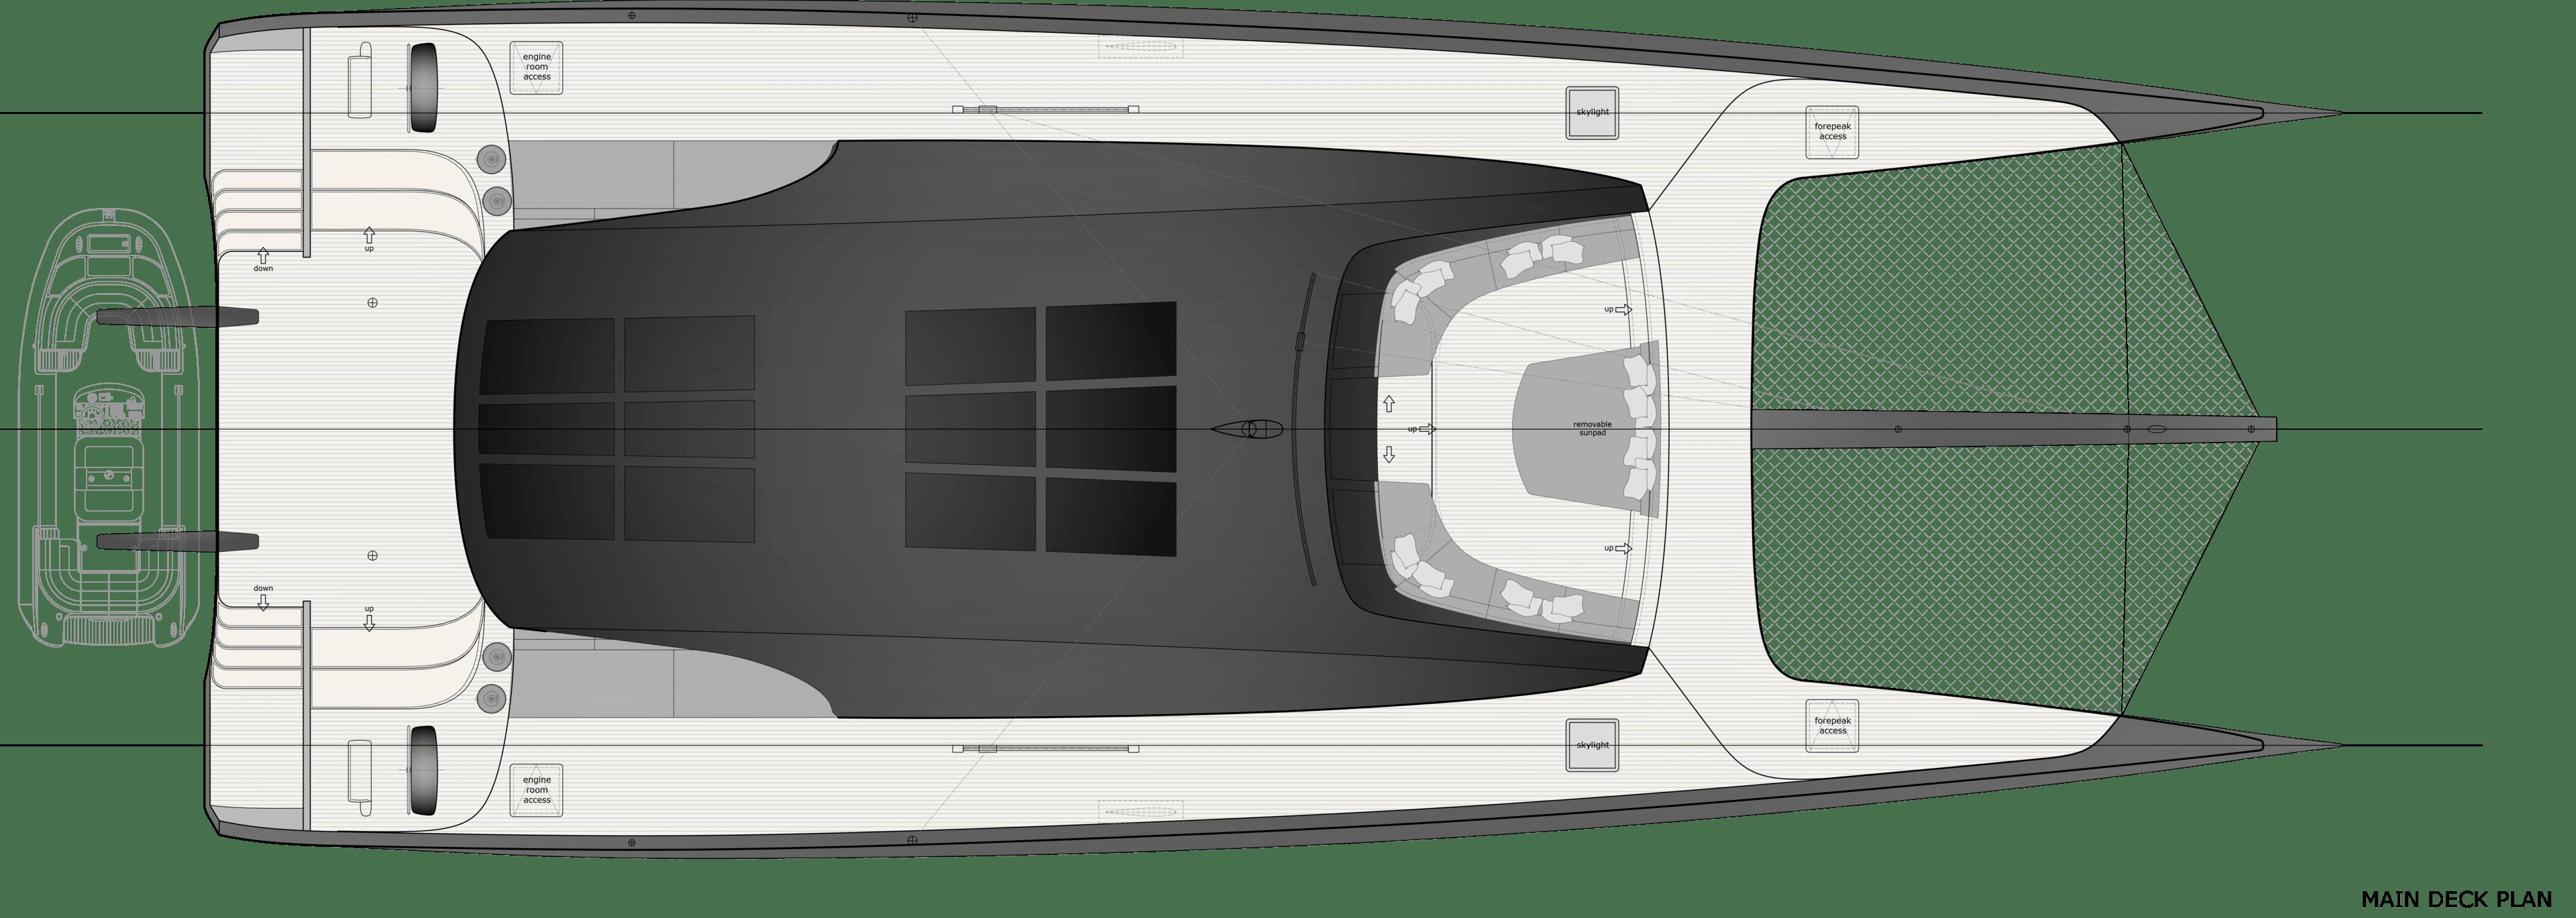 MMYD_066_BlackCat 30_GA2_Deck Plan_publicity.png